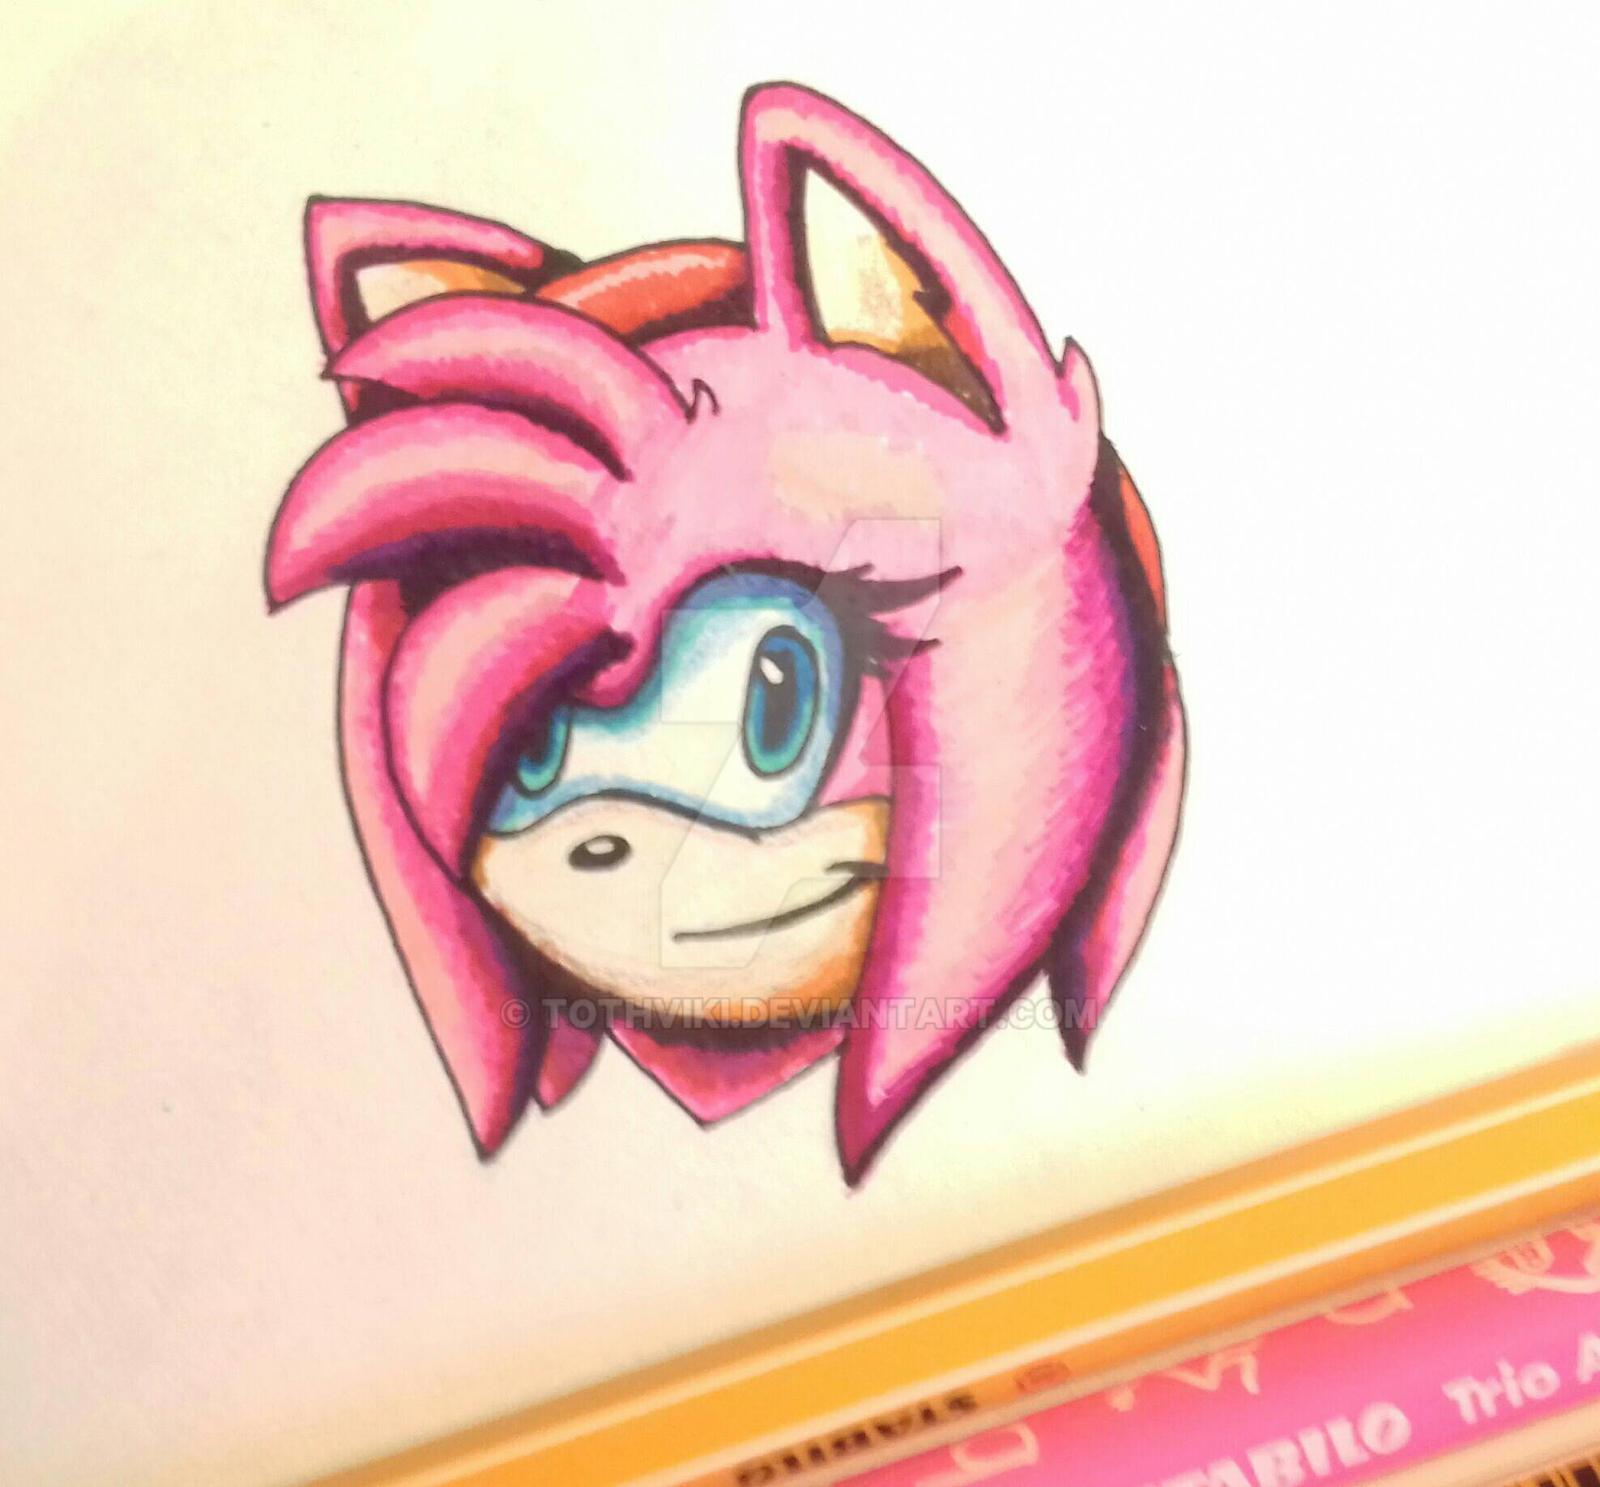 Amy (felt pen drawing) by TothViki